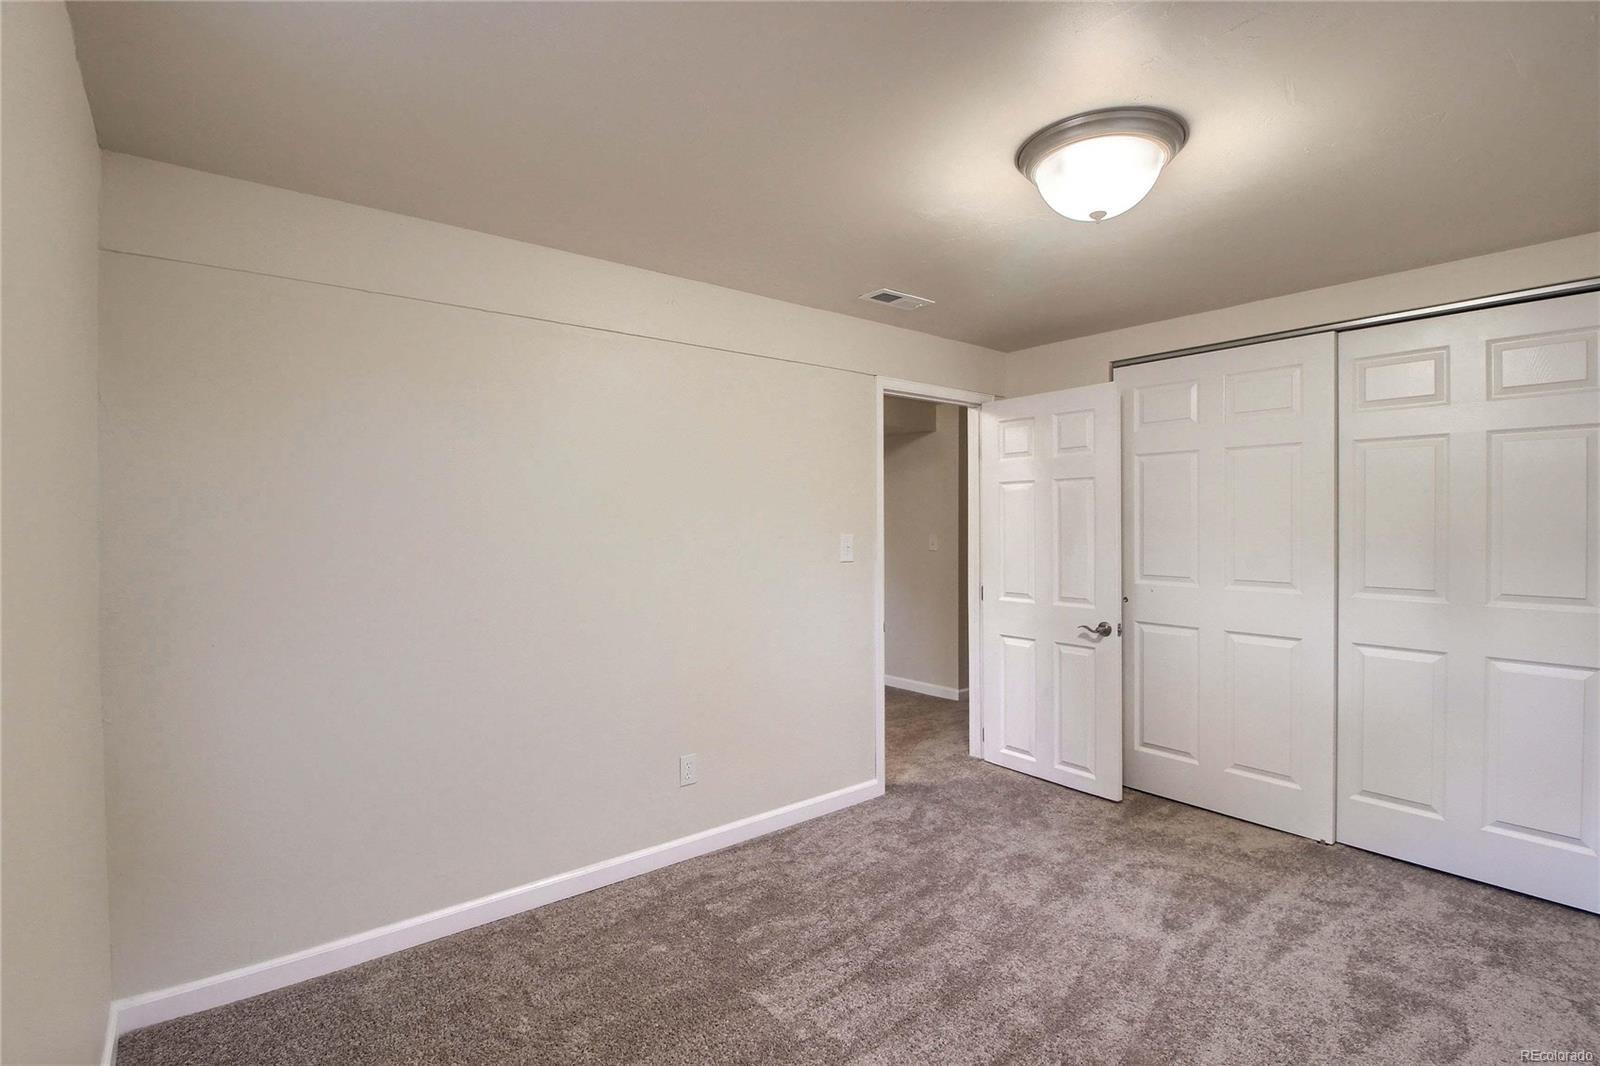 MLS# 3999343 - 5703  W Maplewood Drive, Littleton, CO 80123